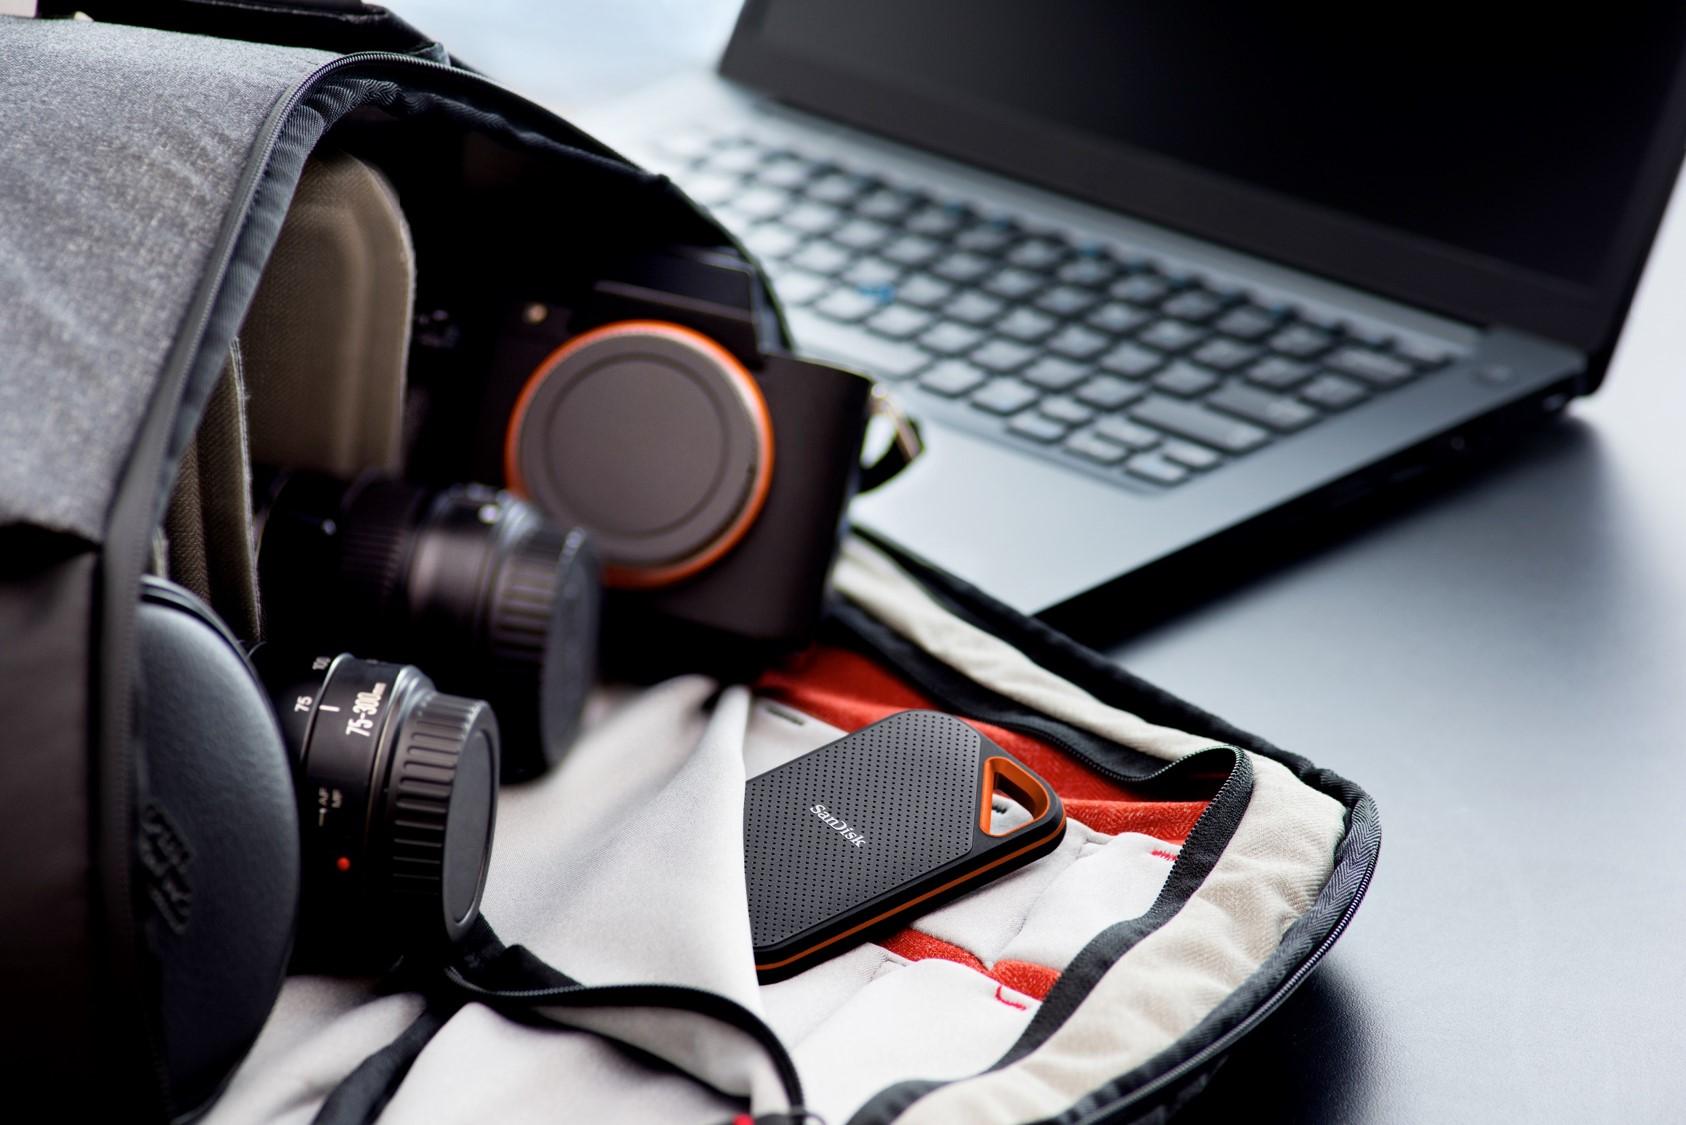 SanDisk Extreme行動固態硬碟系列改版再進化! 完美演繹高速與便攜的極致新品